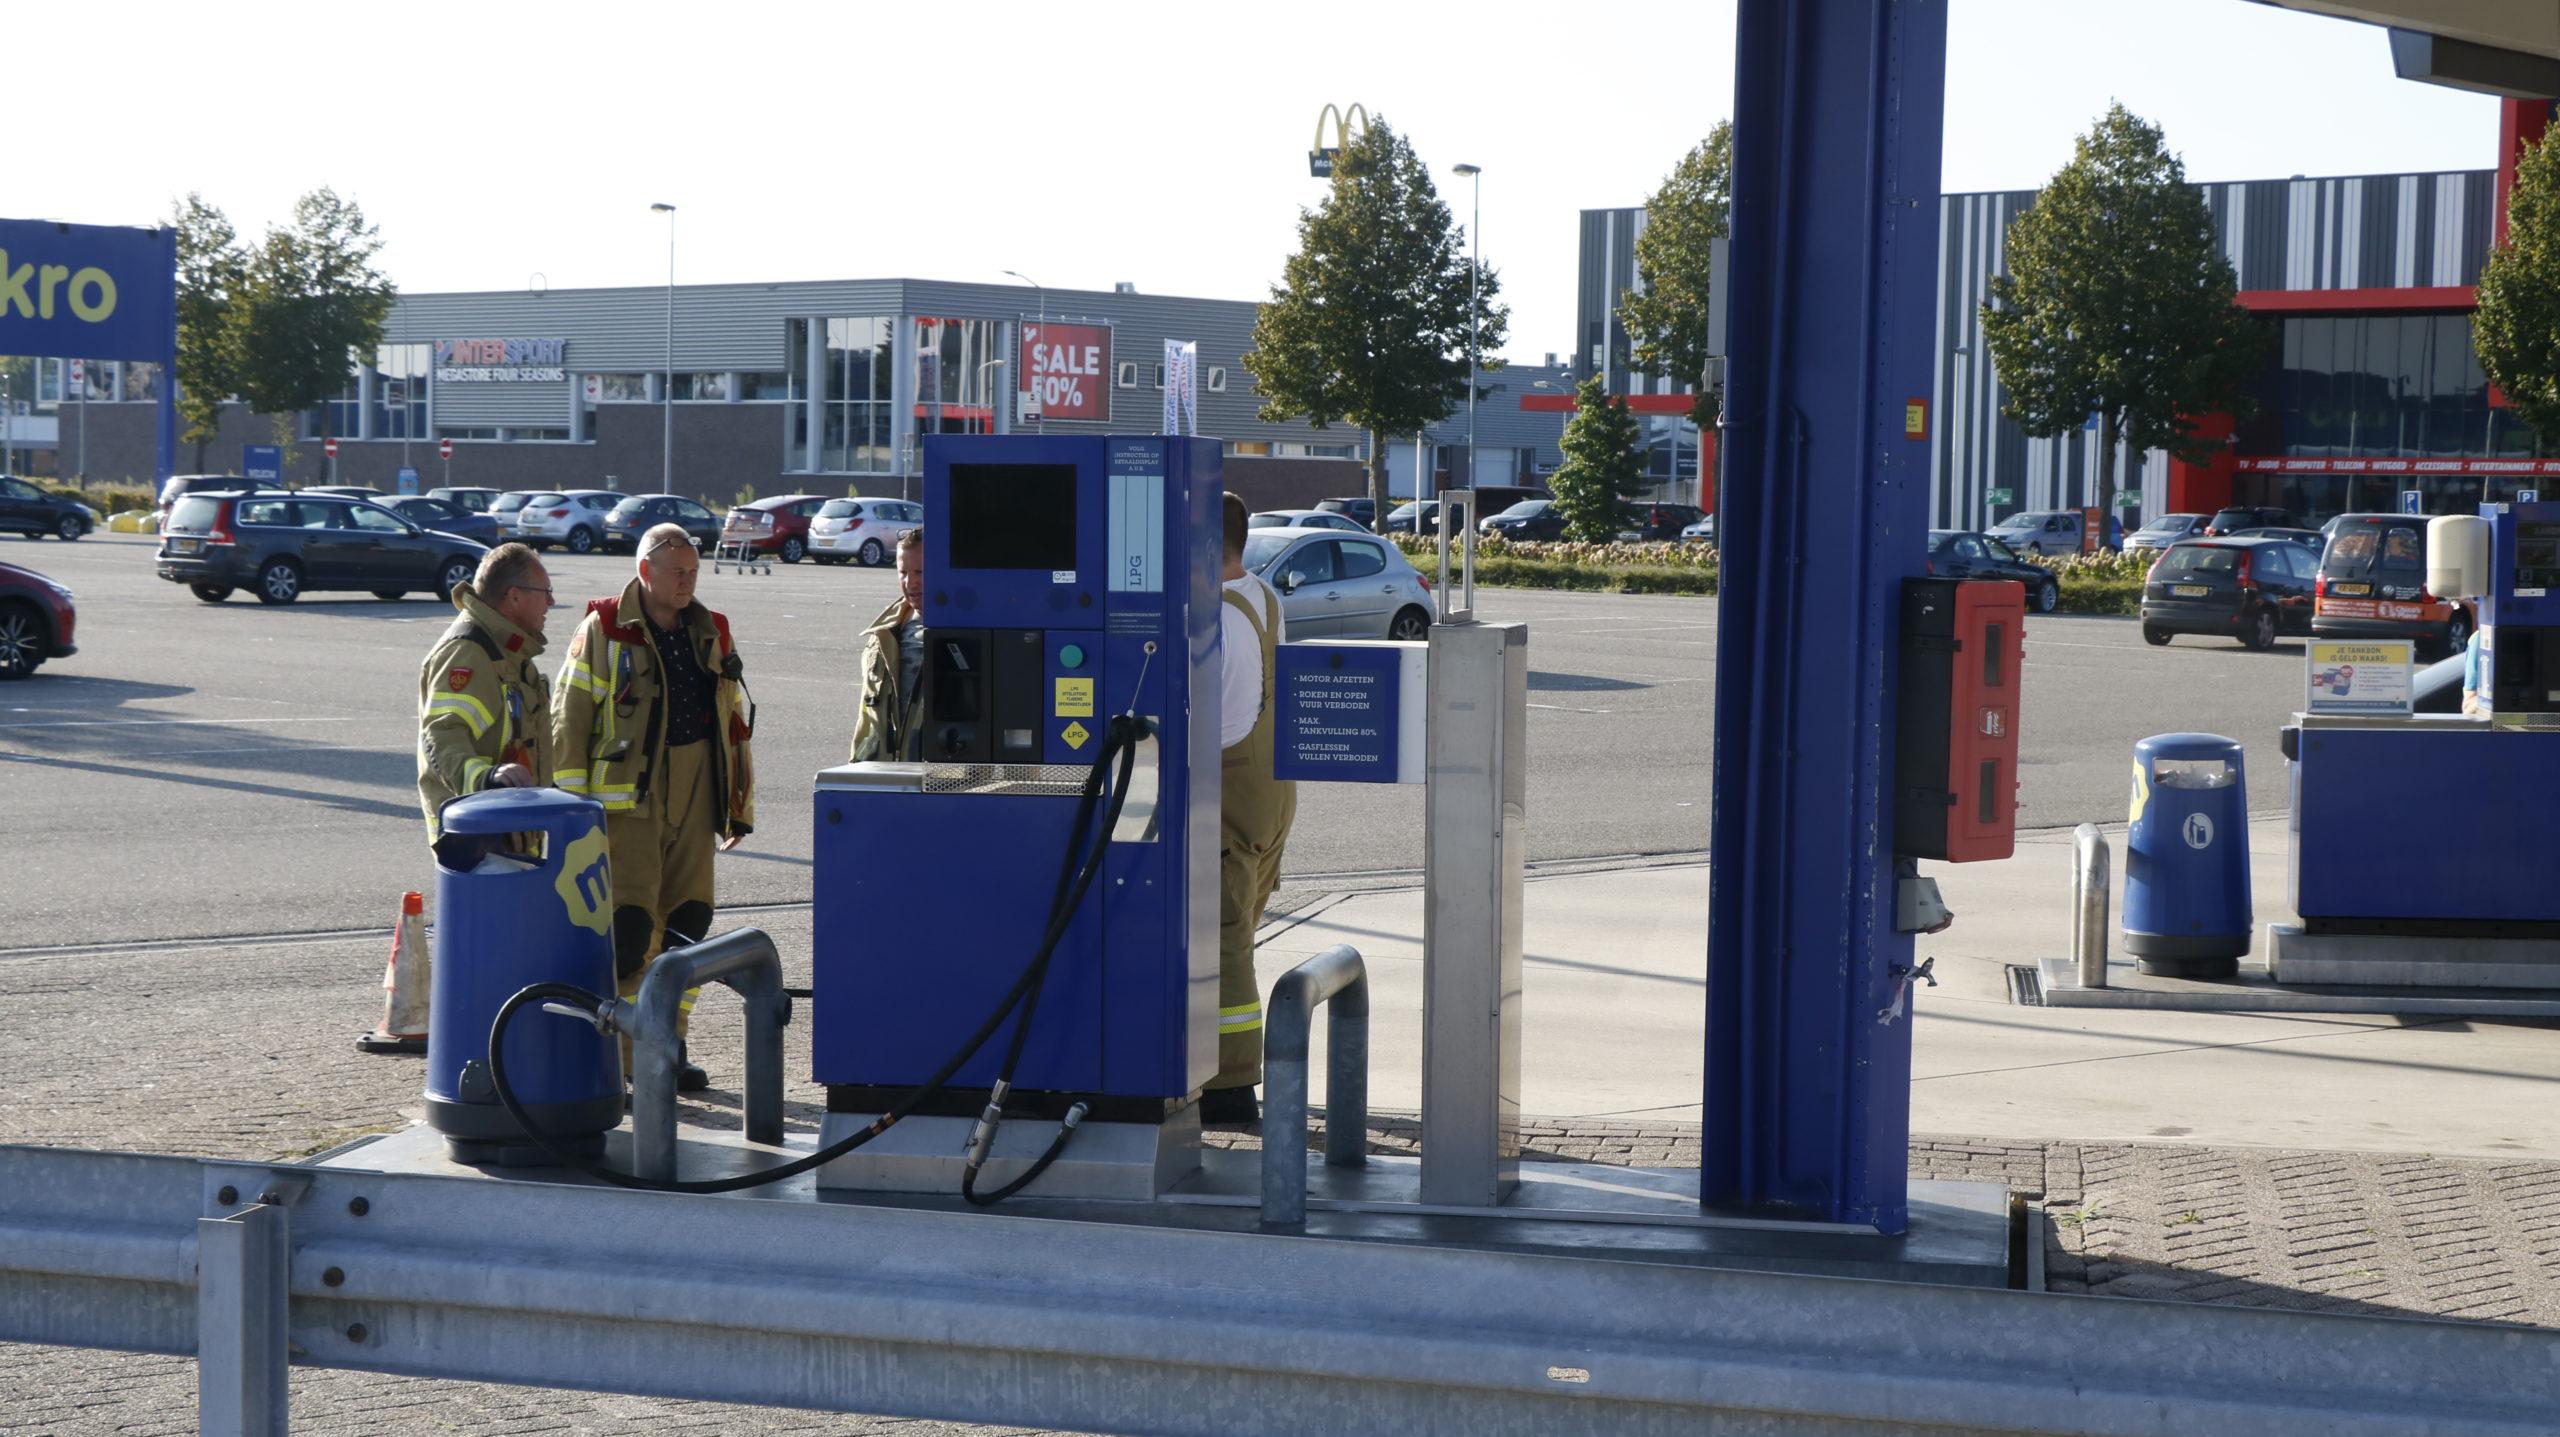 Gaslucht bij tankstation Makro Duiven.